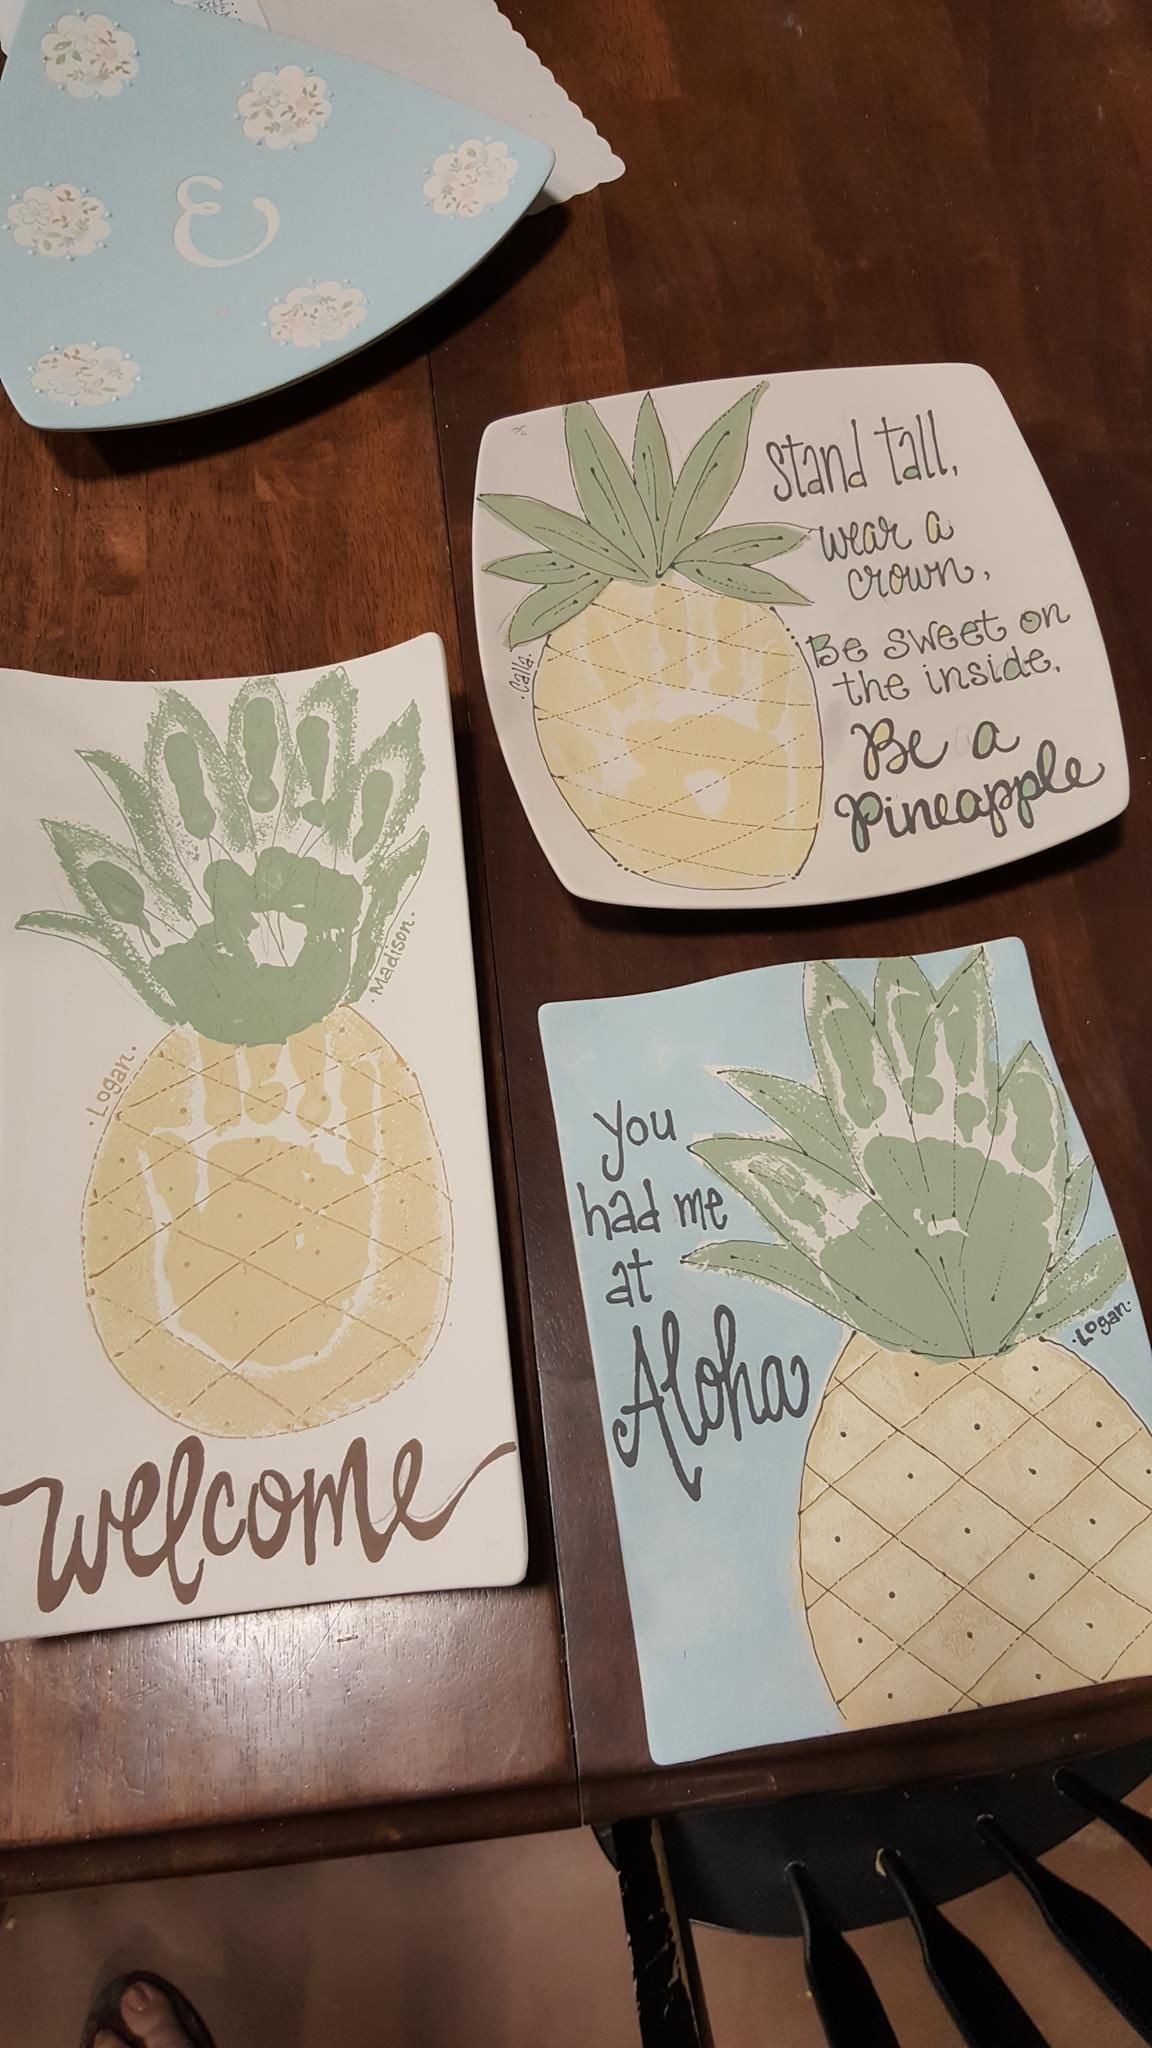 120 Handprints Footprints Ideas Paint Your Own Pottery Handprint Art Footprint Art